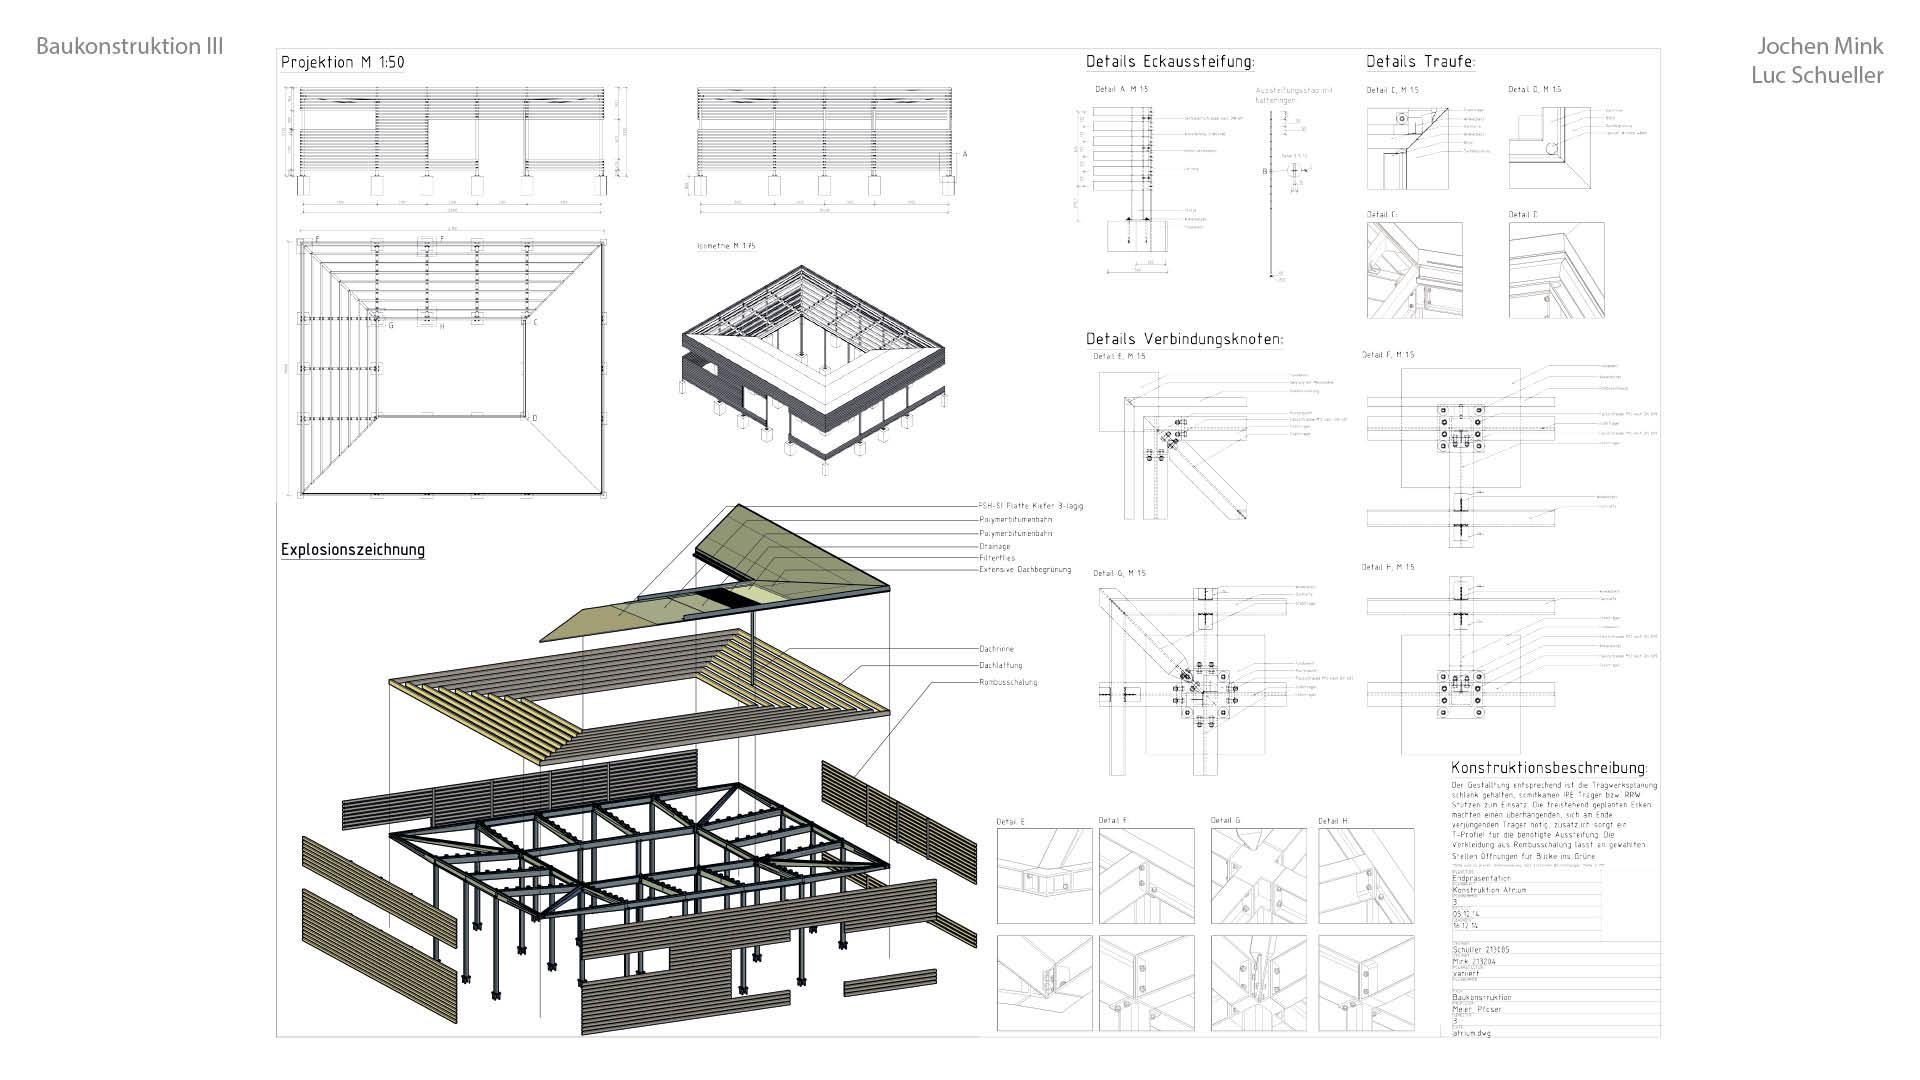 13 14 03 Baukonstruktion III